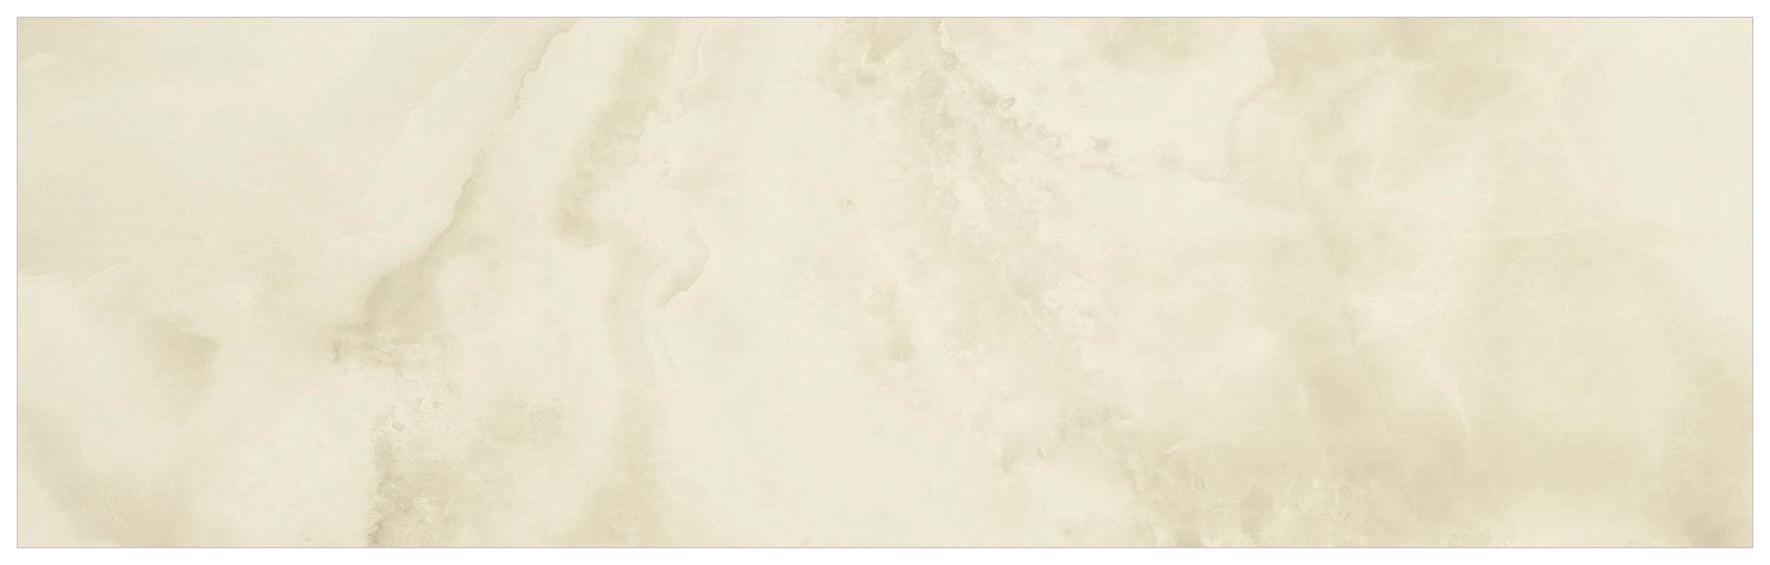 Onice-Bianco-1000x3000x5mm